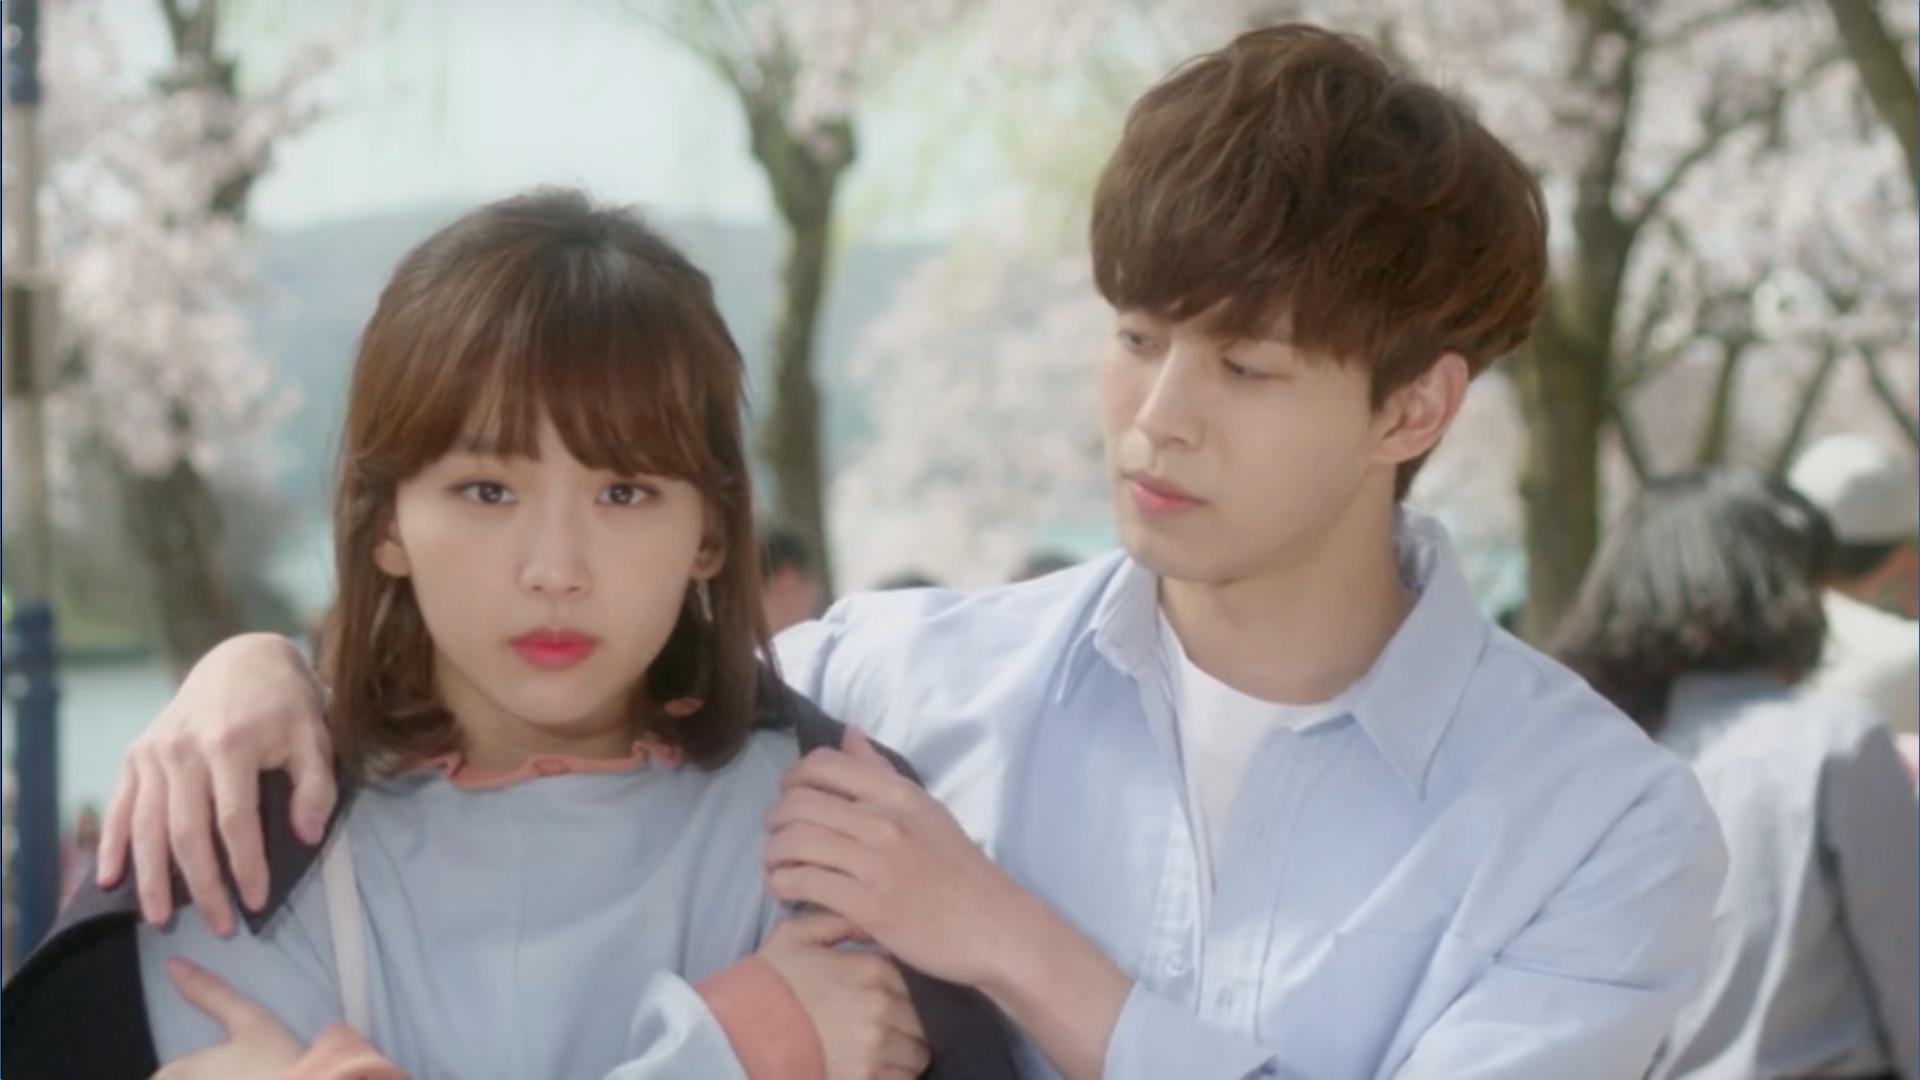 Wednesday 3:30 PM Seon Eun-woo and Yoon Jae-won putting a jacket on her